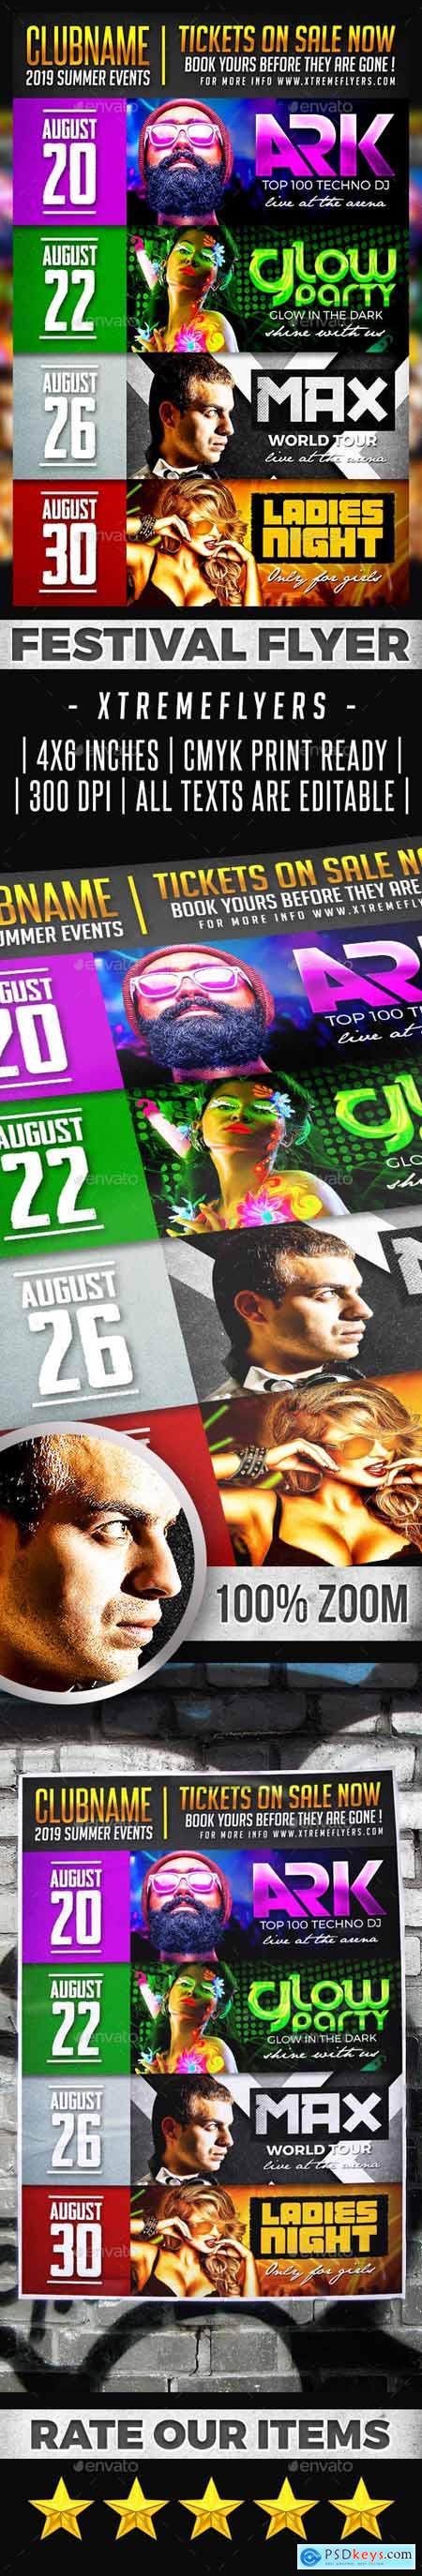 Festival Schedule Flyer 23788912